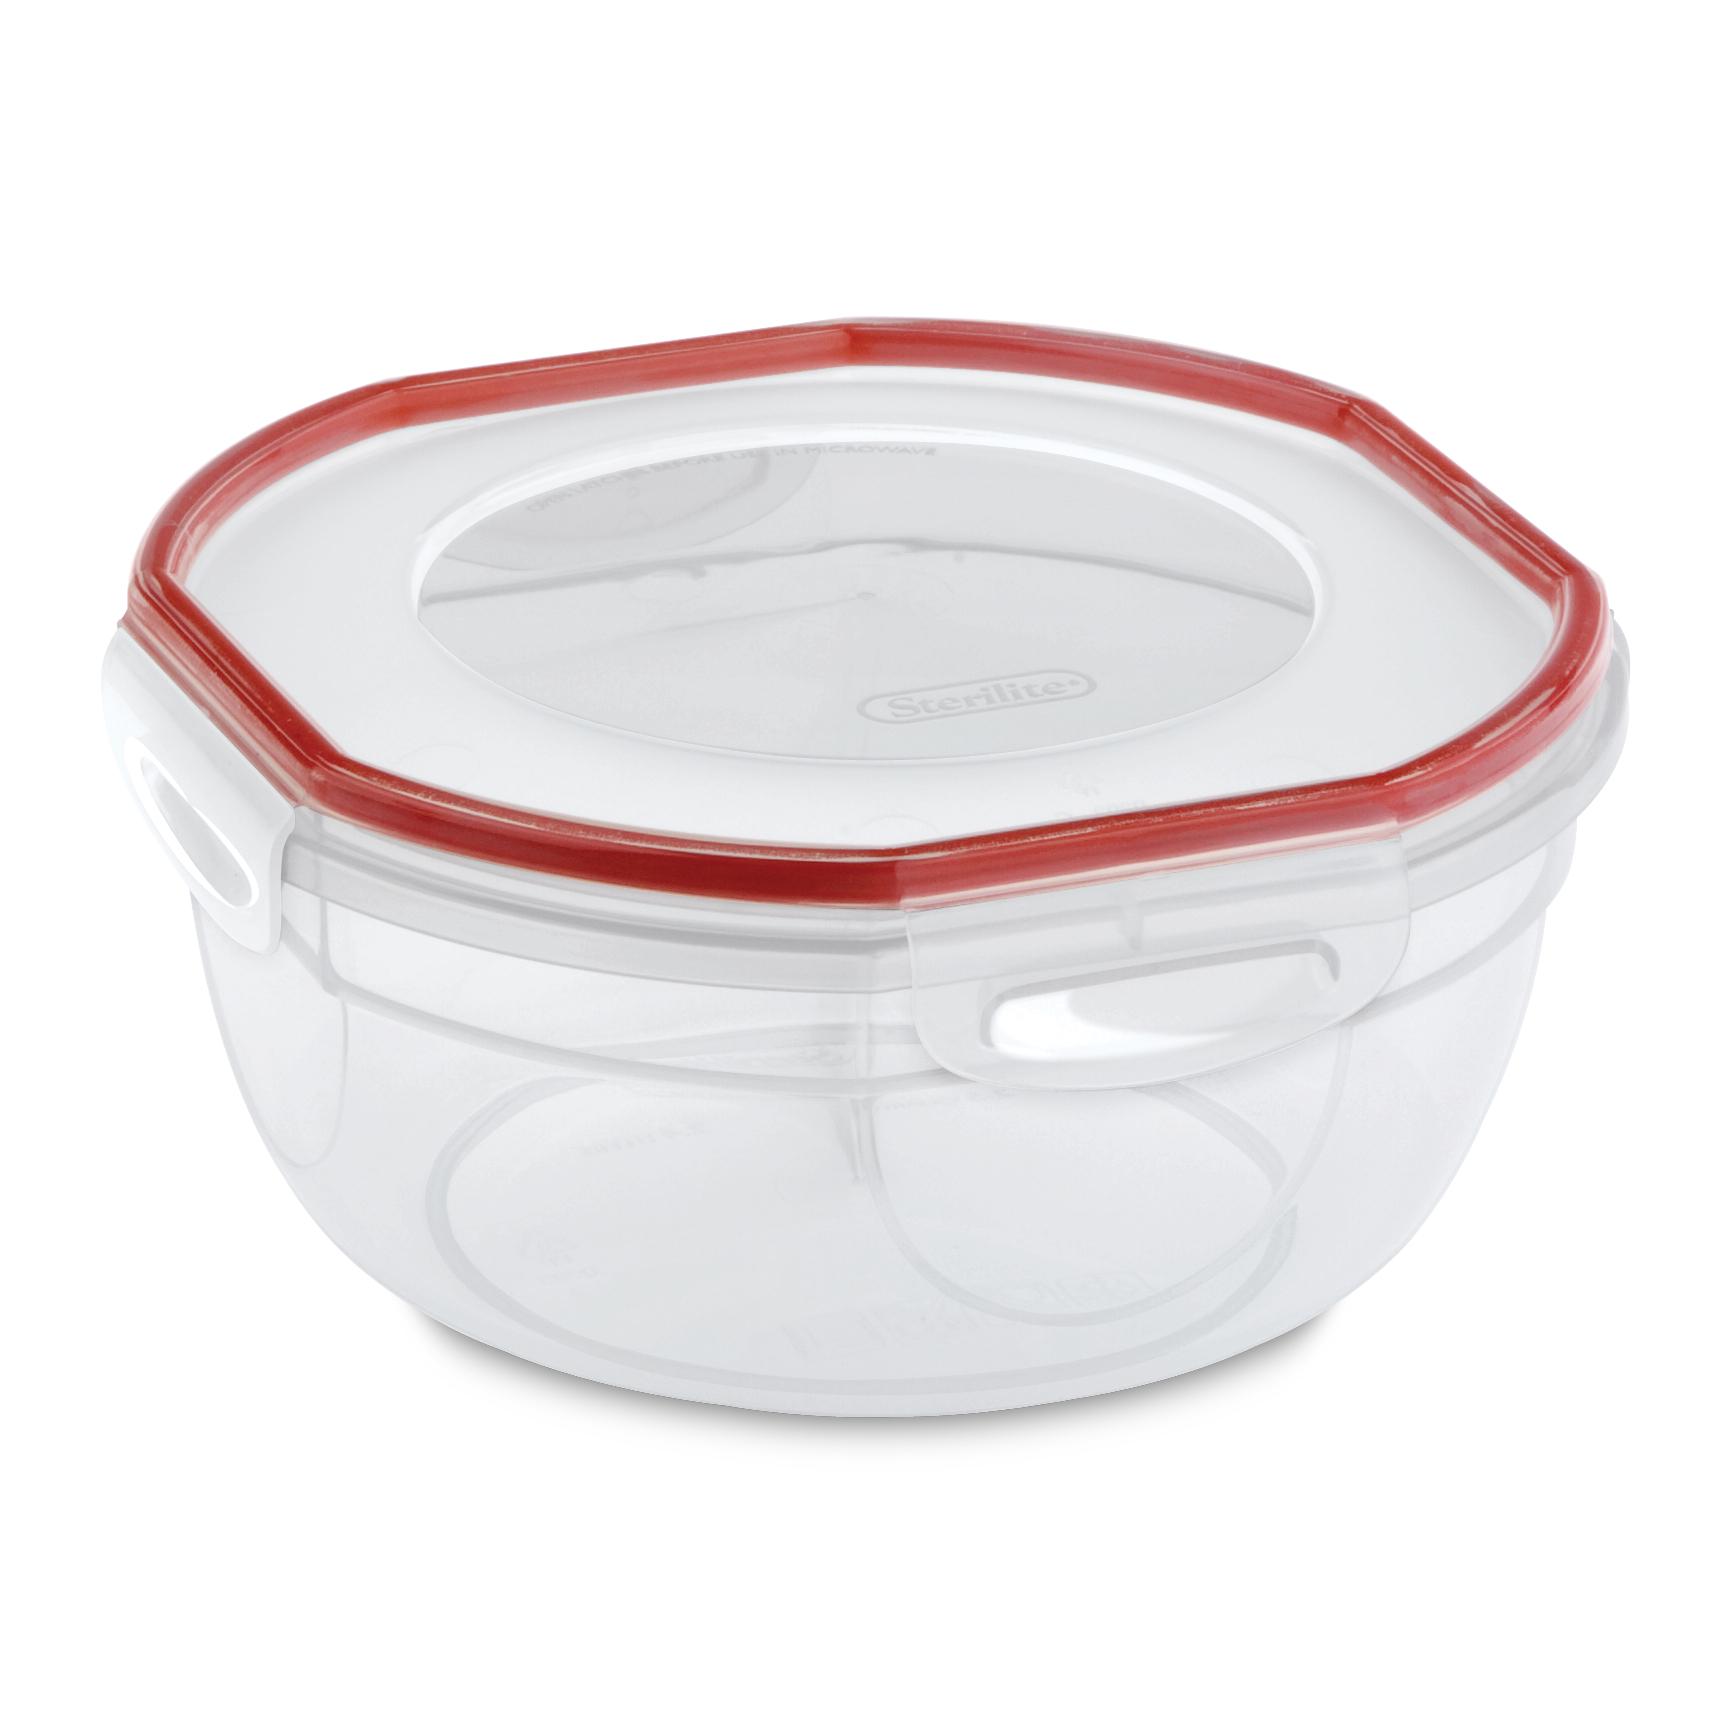 Sterilite Ultra-Seal 2.5 Qt. Food Storage Bowl (Set of 4)